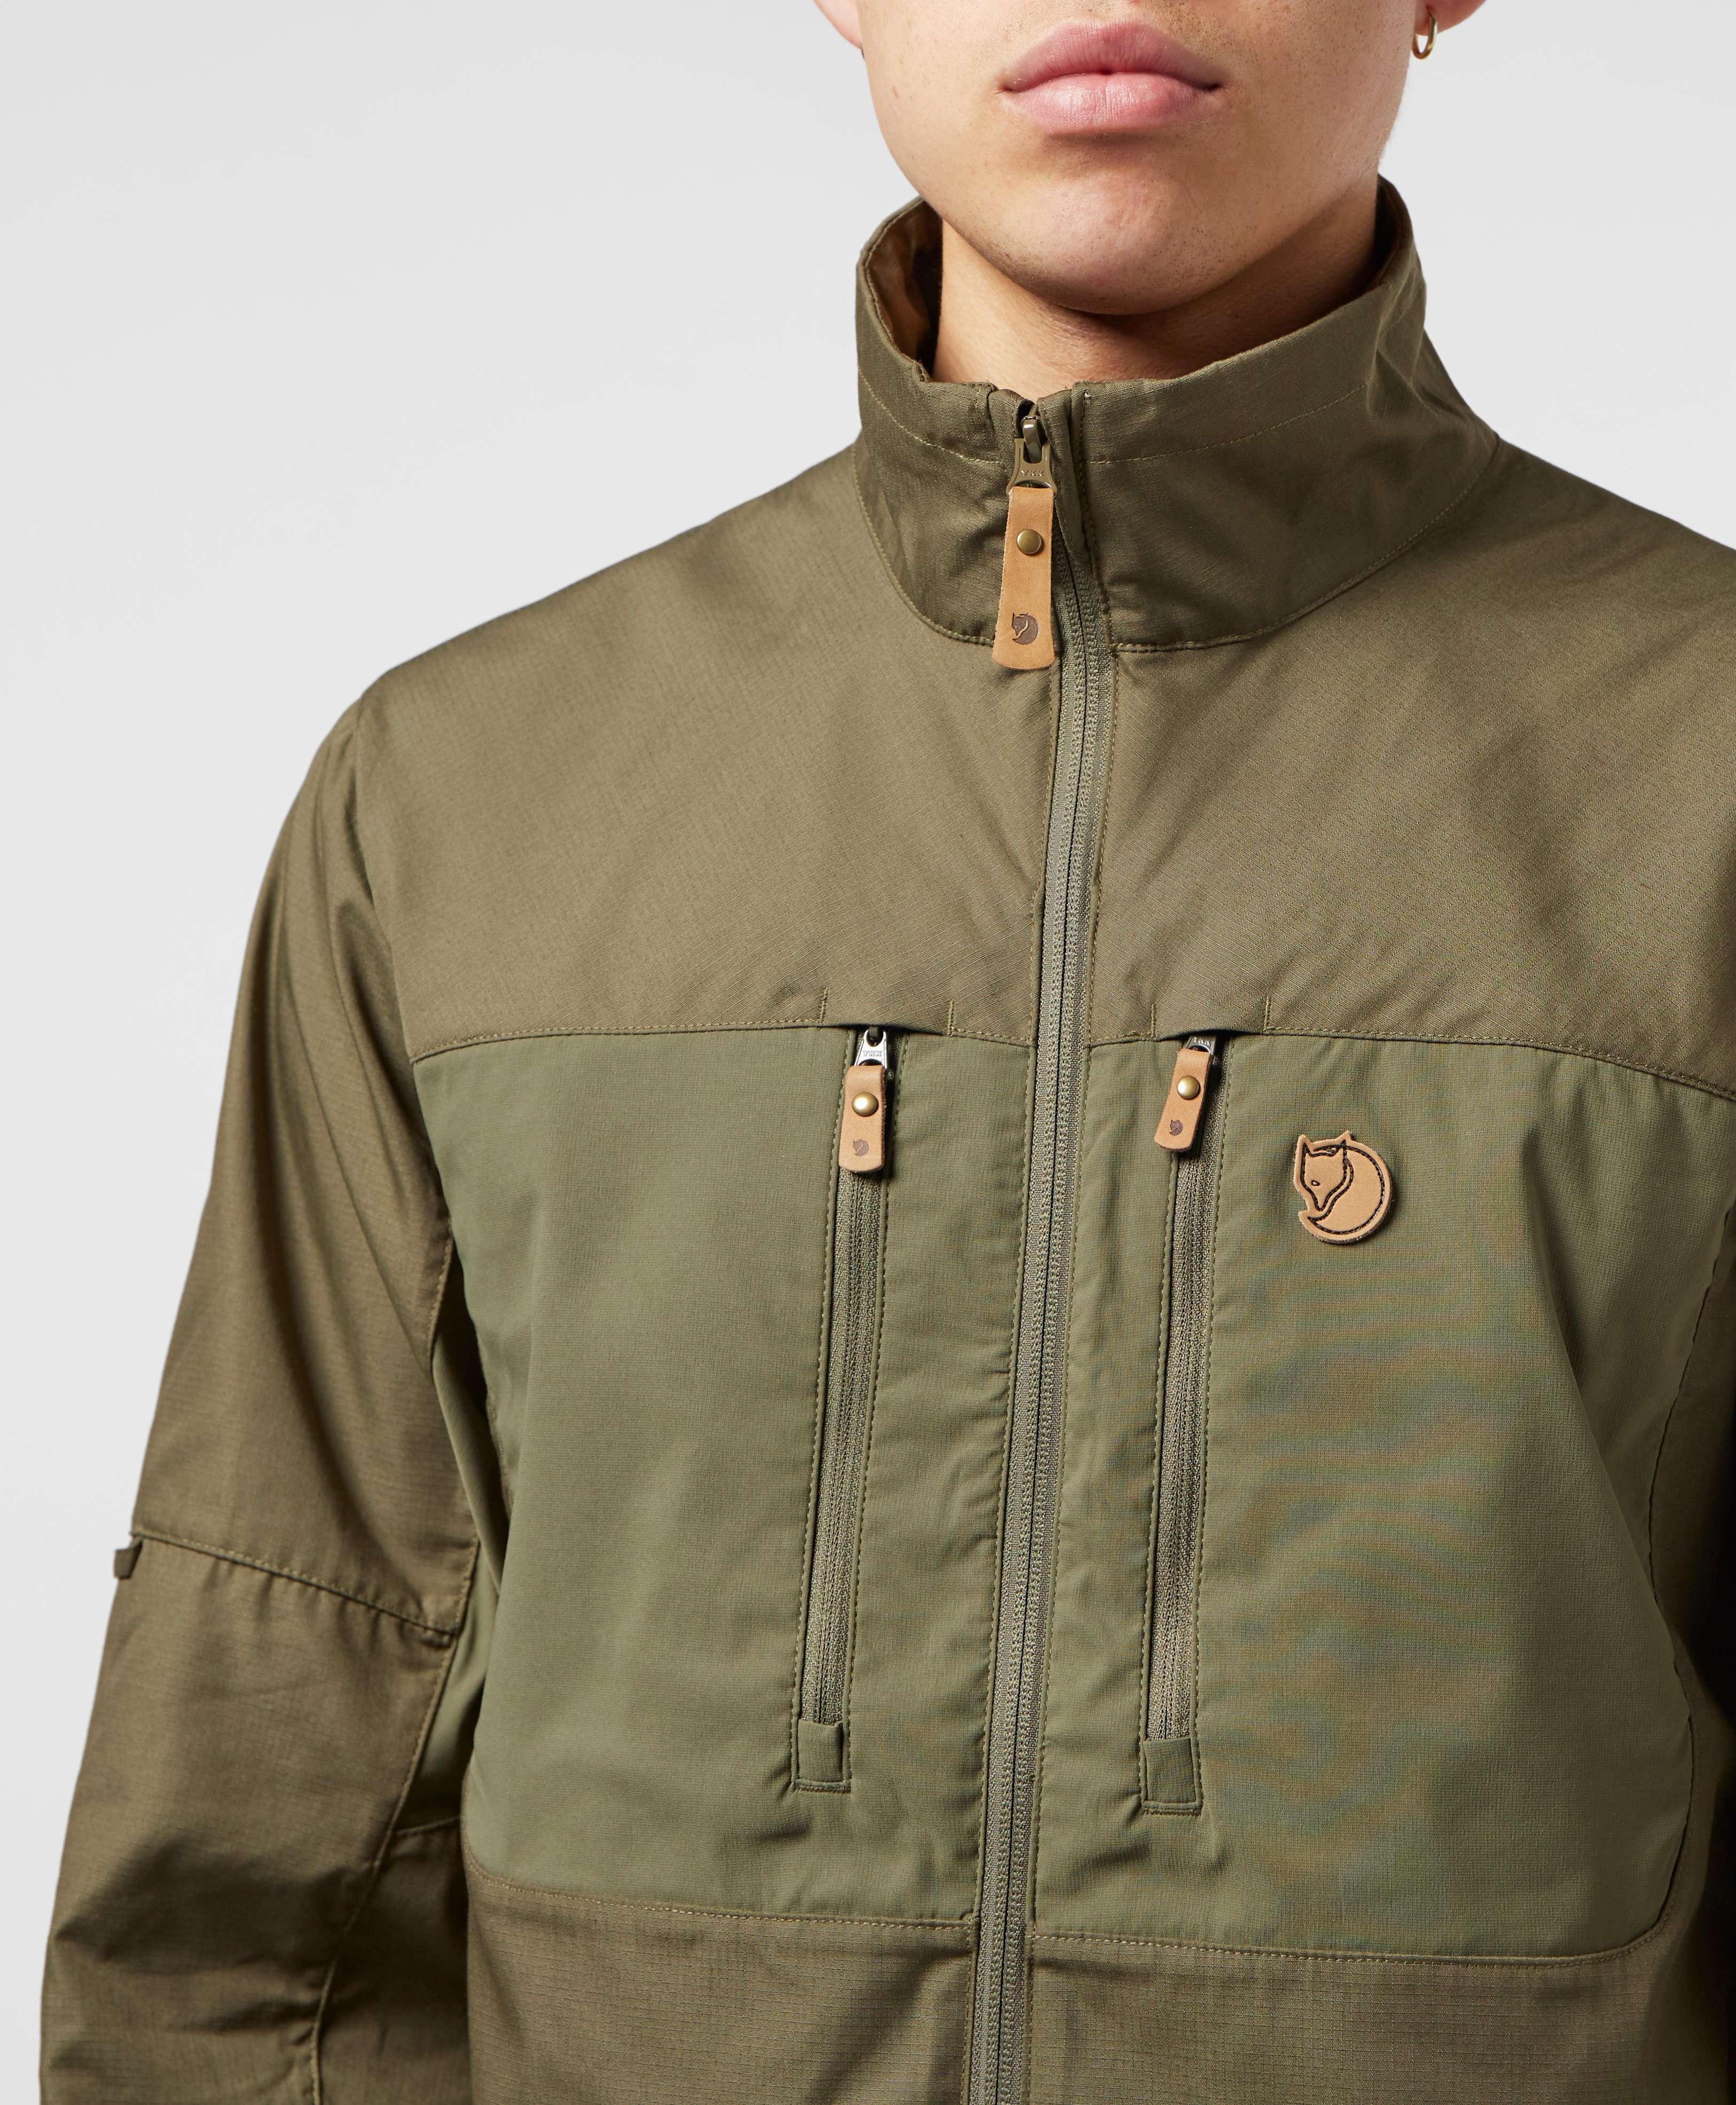 Fjallraven Abisko Lightweight Jacket